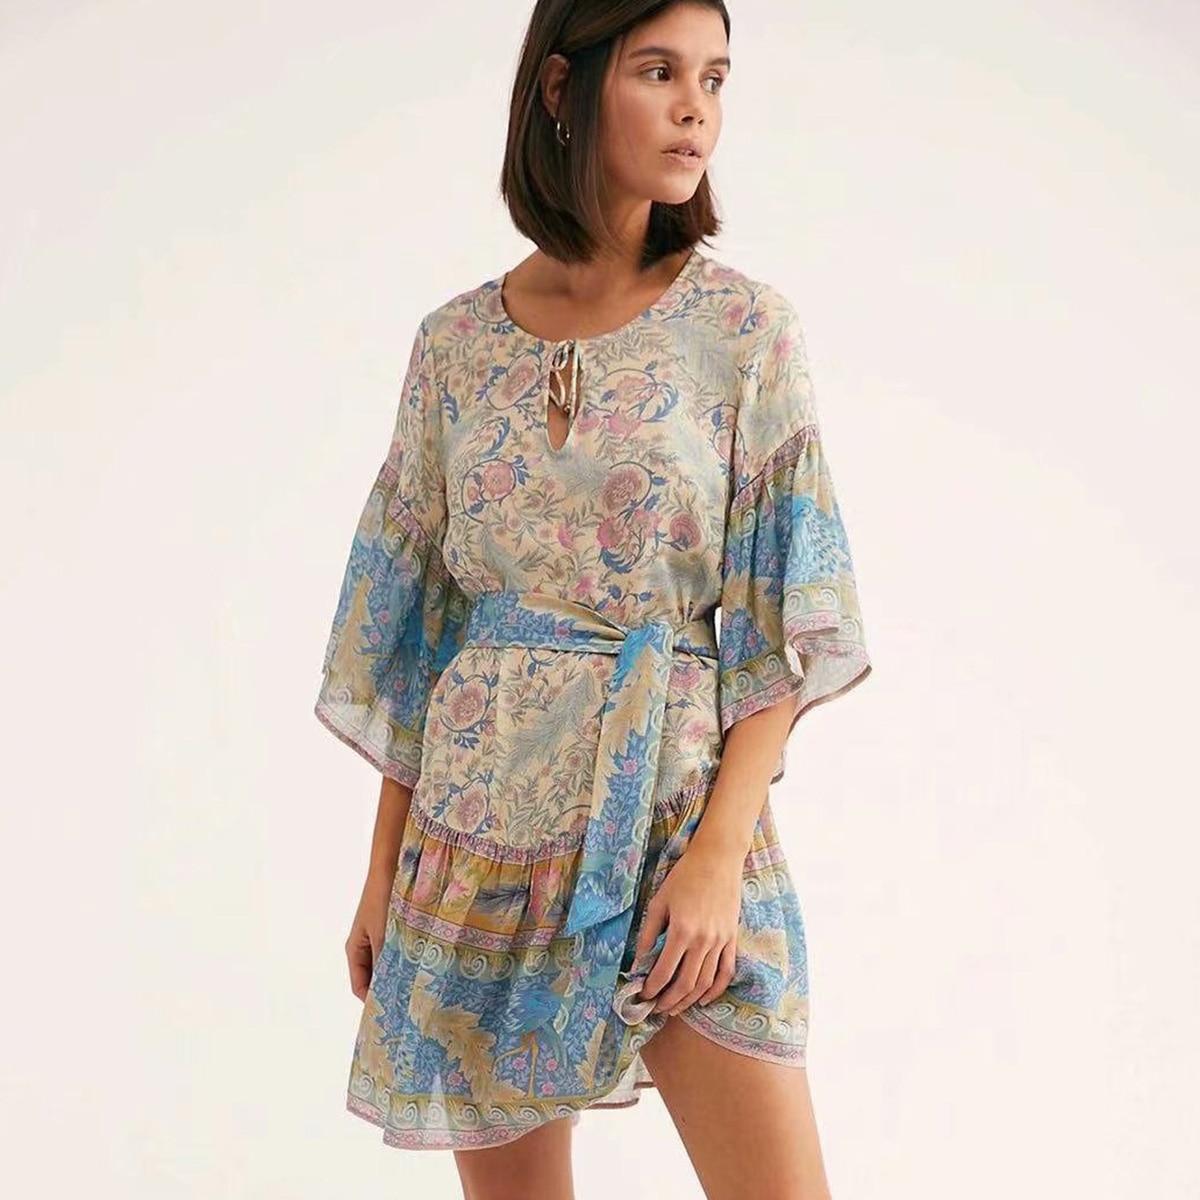 98ad03889aef Oasis Mini Dress V Neck Short Sleeve Summer Dresses Boho Beach Floral Print  Dress Casual Hippie Short Women Dresses(no belts)-in Dresses from Women's  ...